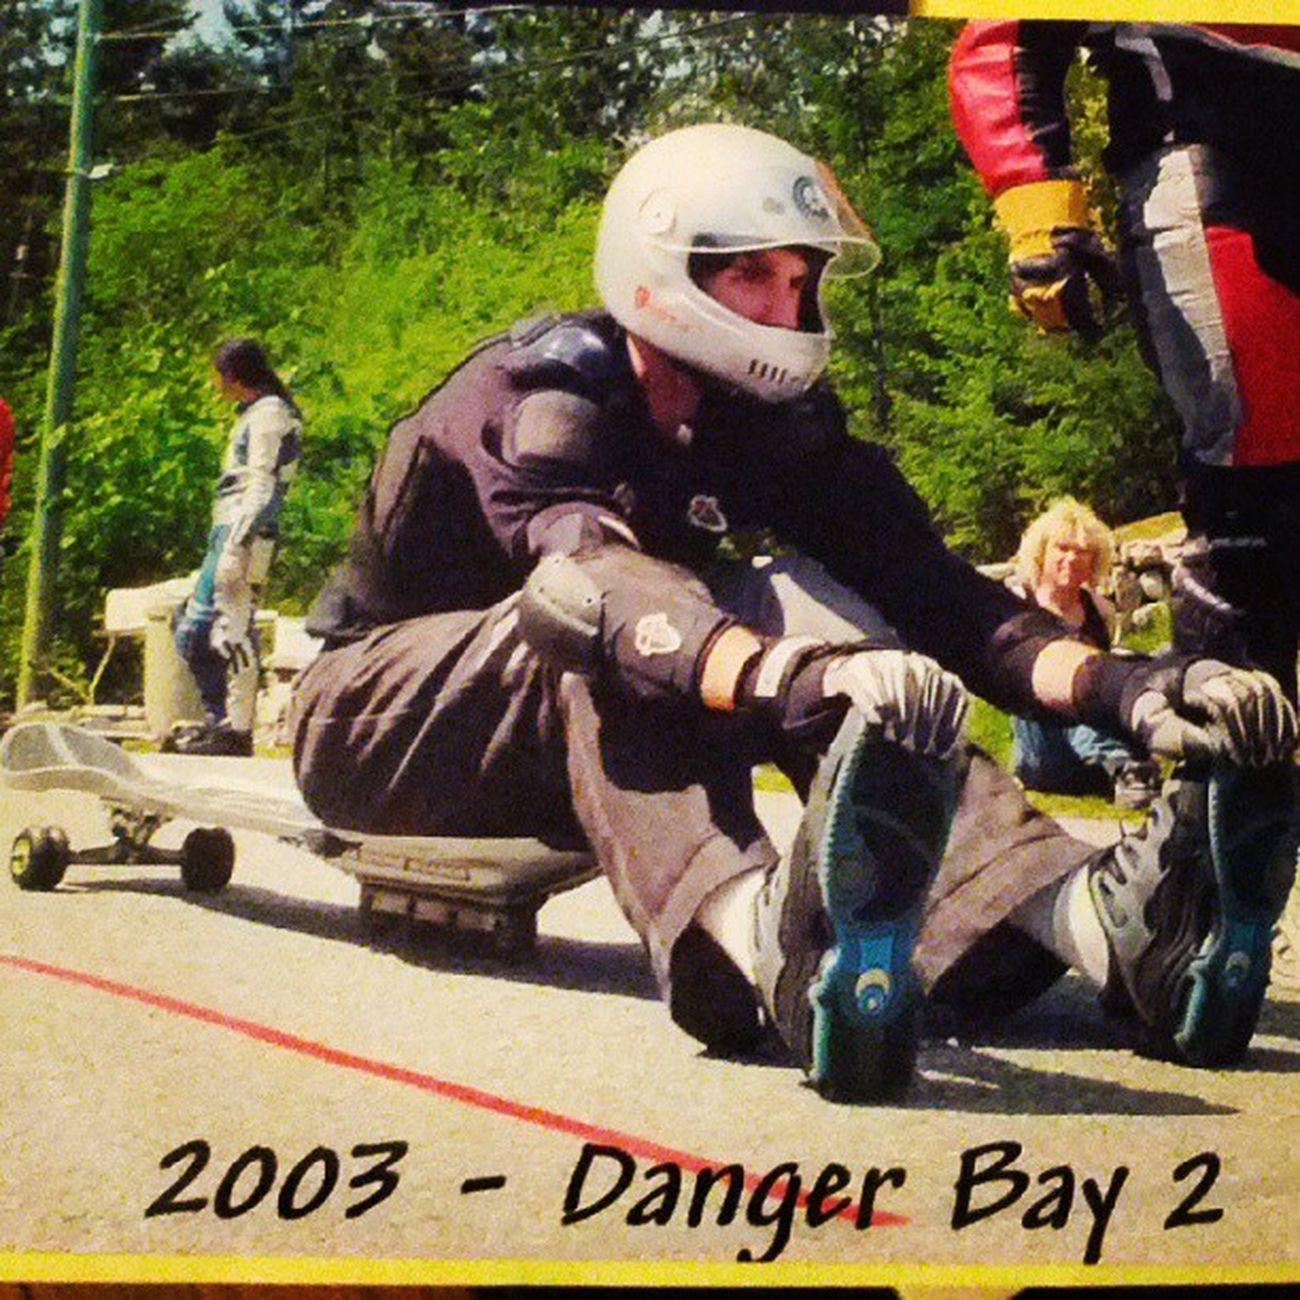 2003 DangerBay COASTLONGBOARDING @theobad check this out Bodyarmor Startline